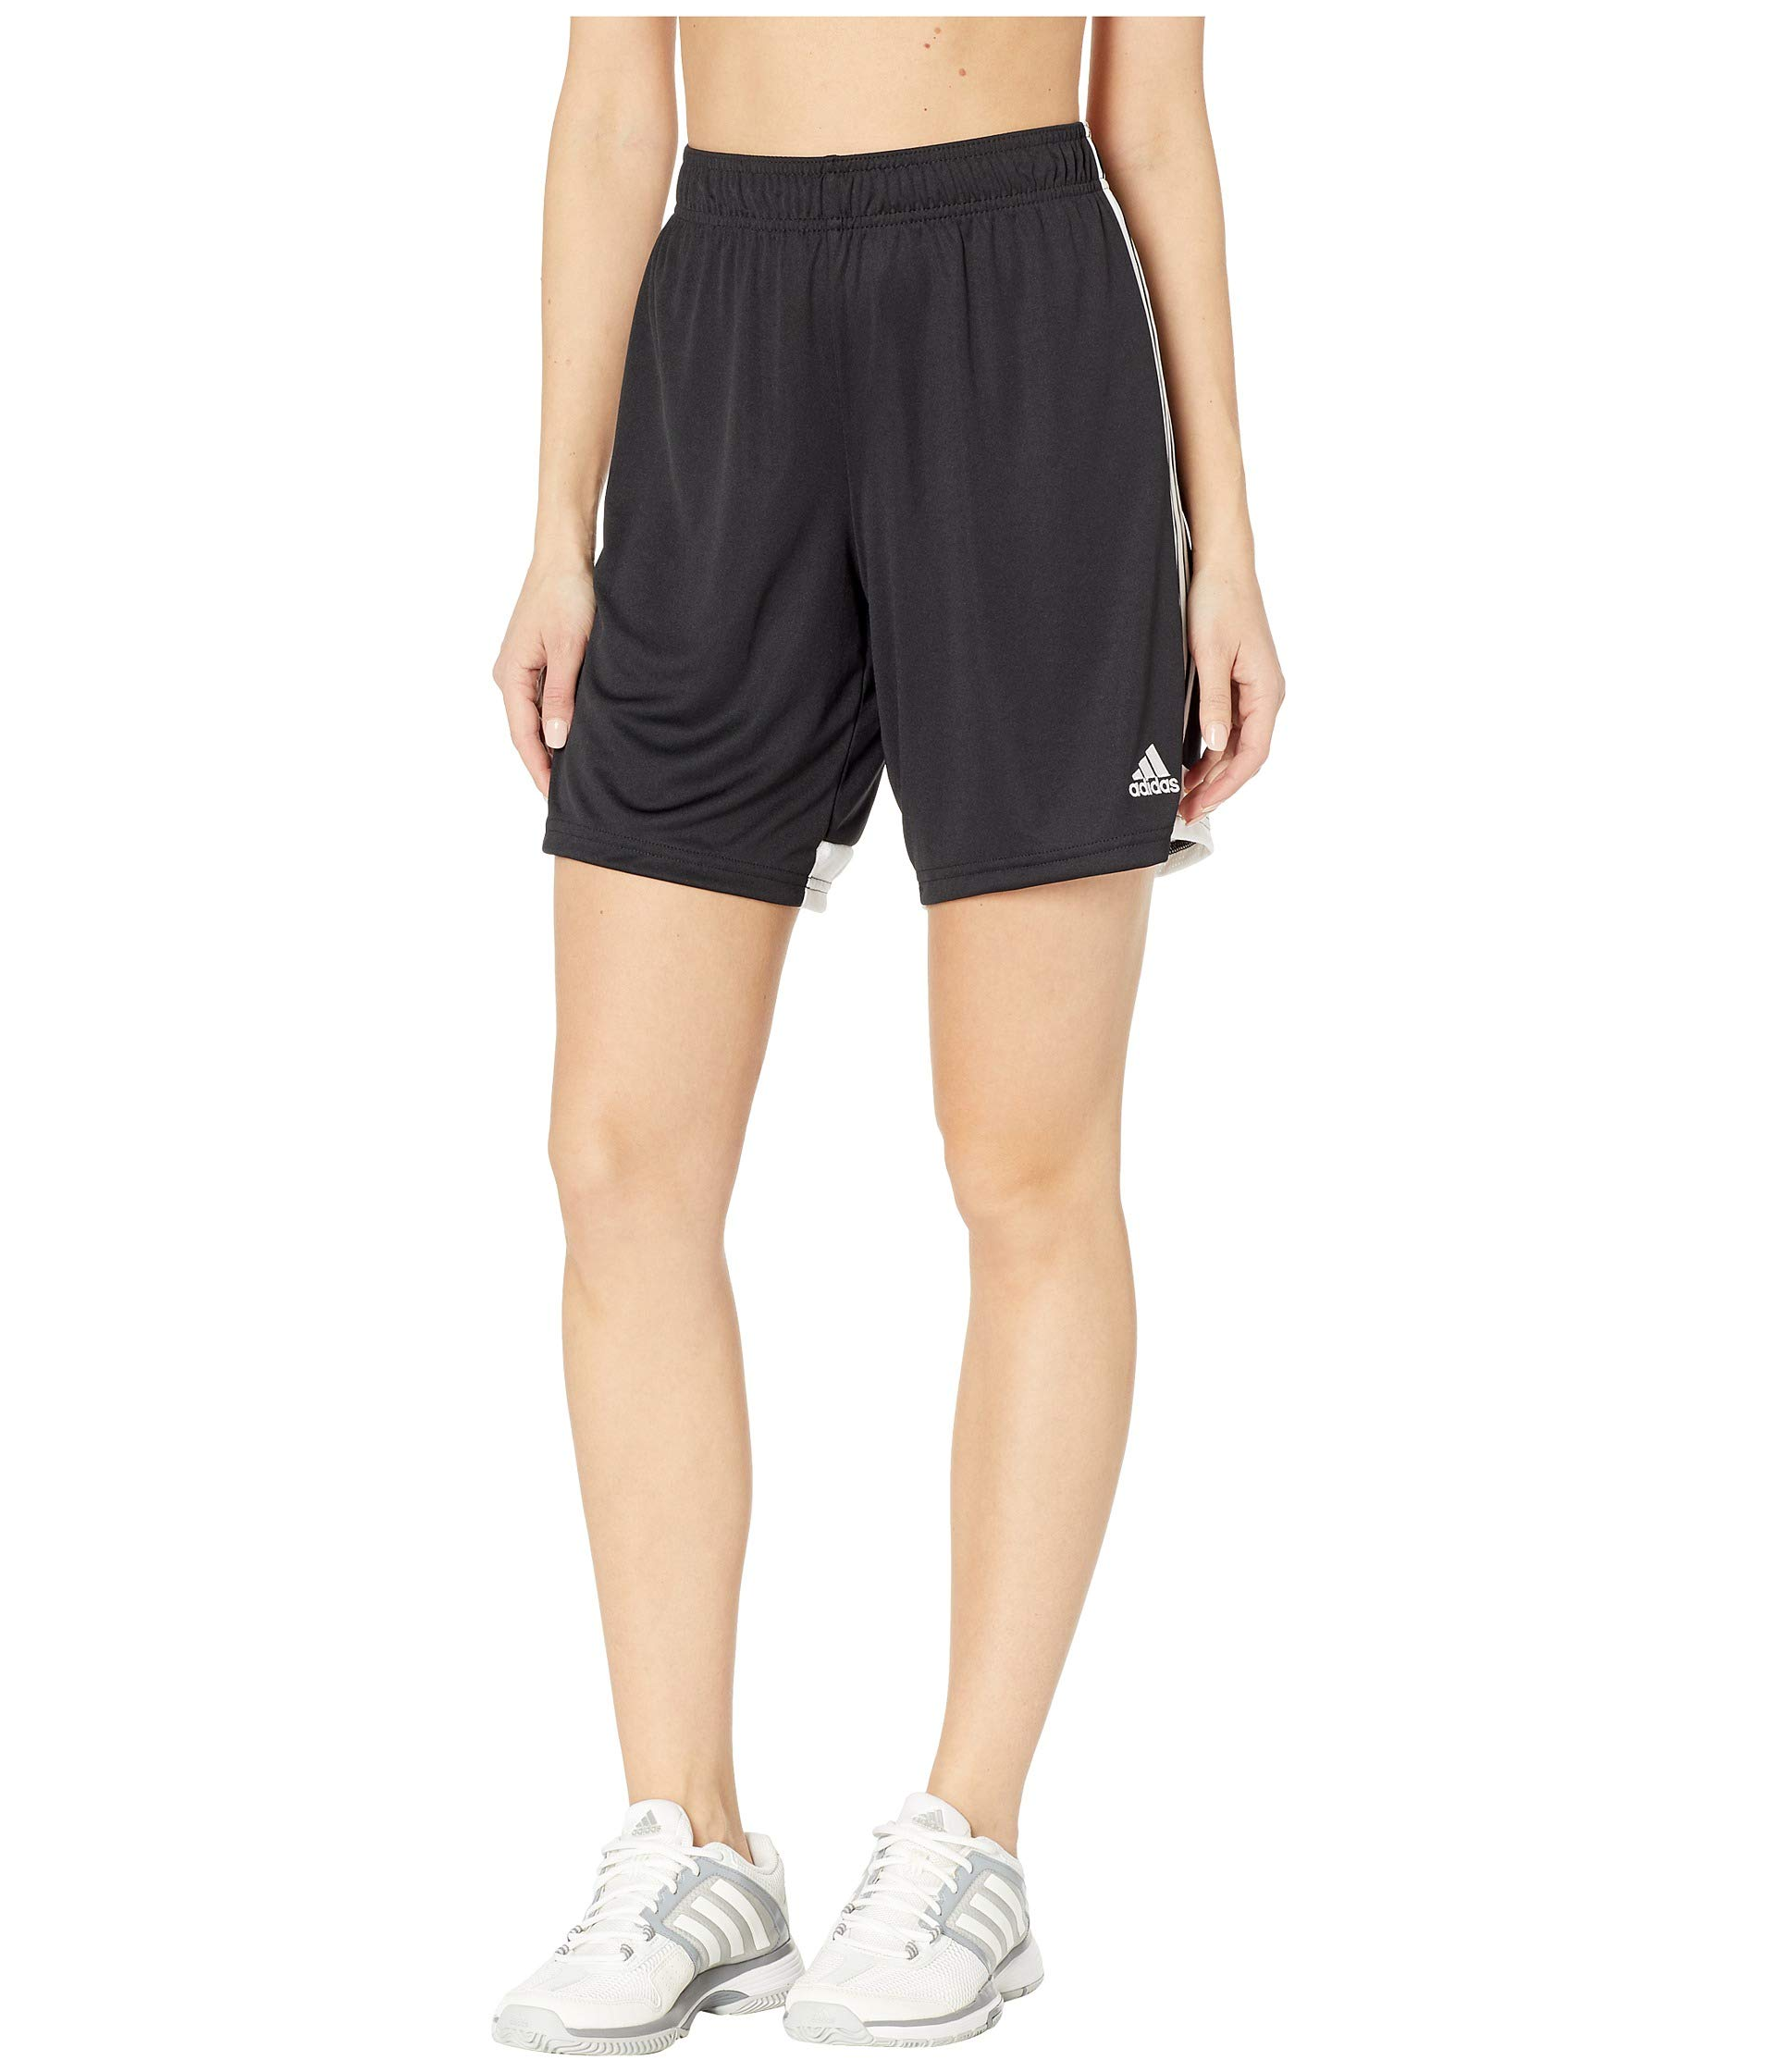 adidas Women's Tastigo 19 Shorts, Black/White, X-Small/Large by adidas